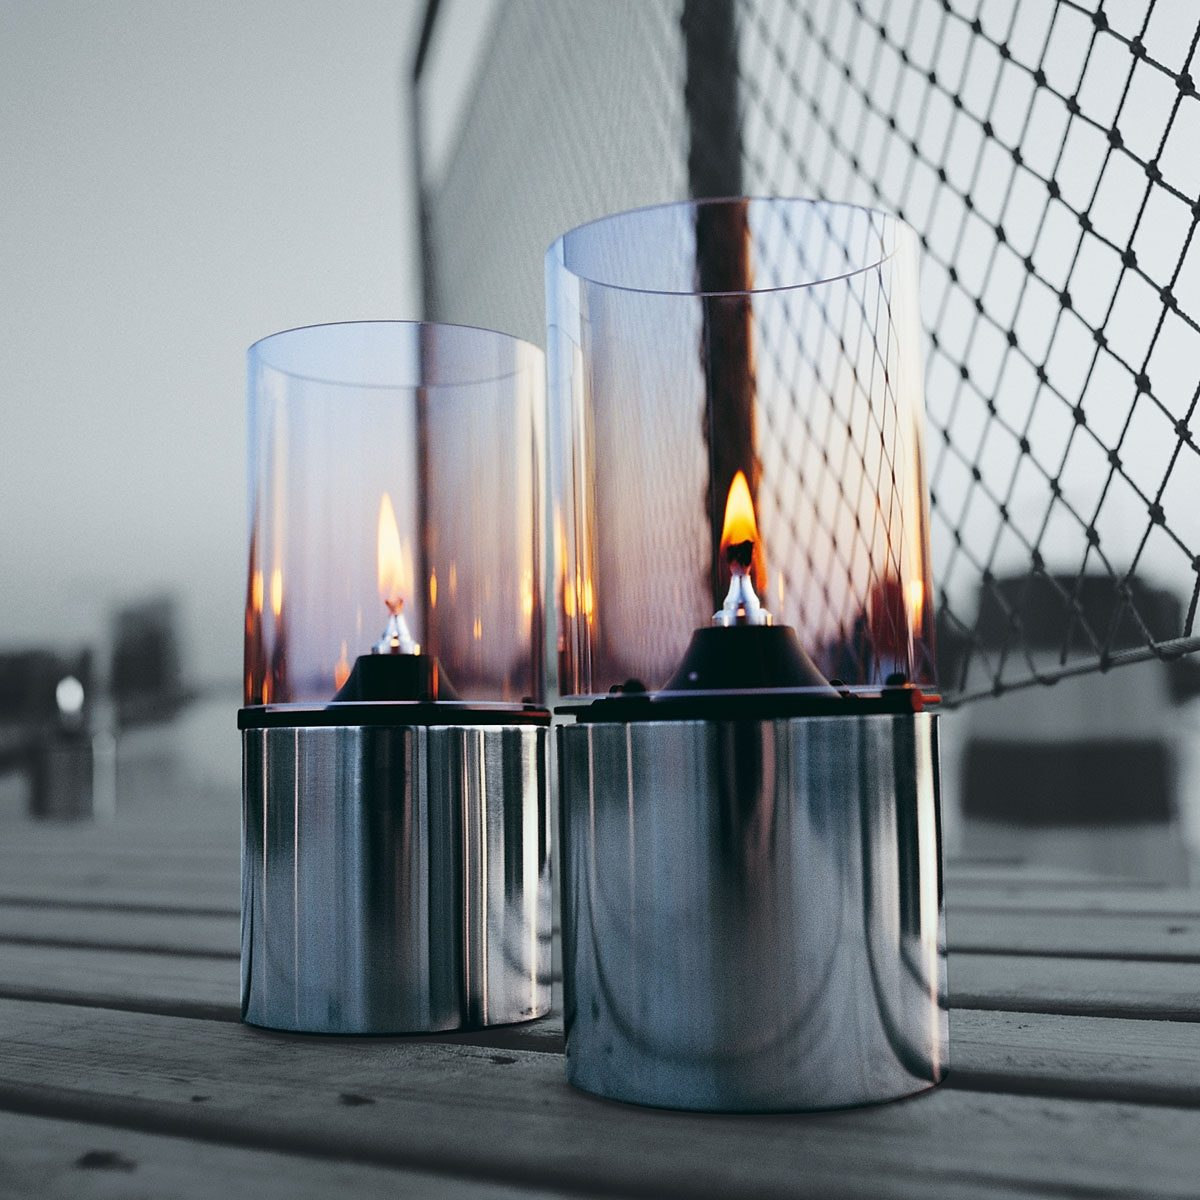 Stelton Stelton Öllampe mit Glasschirm klar